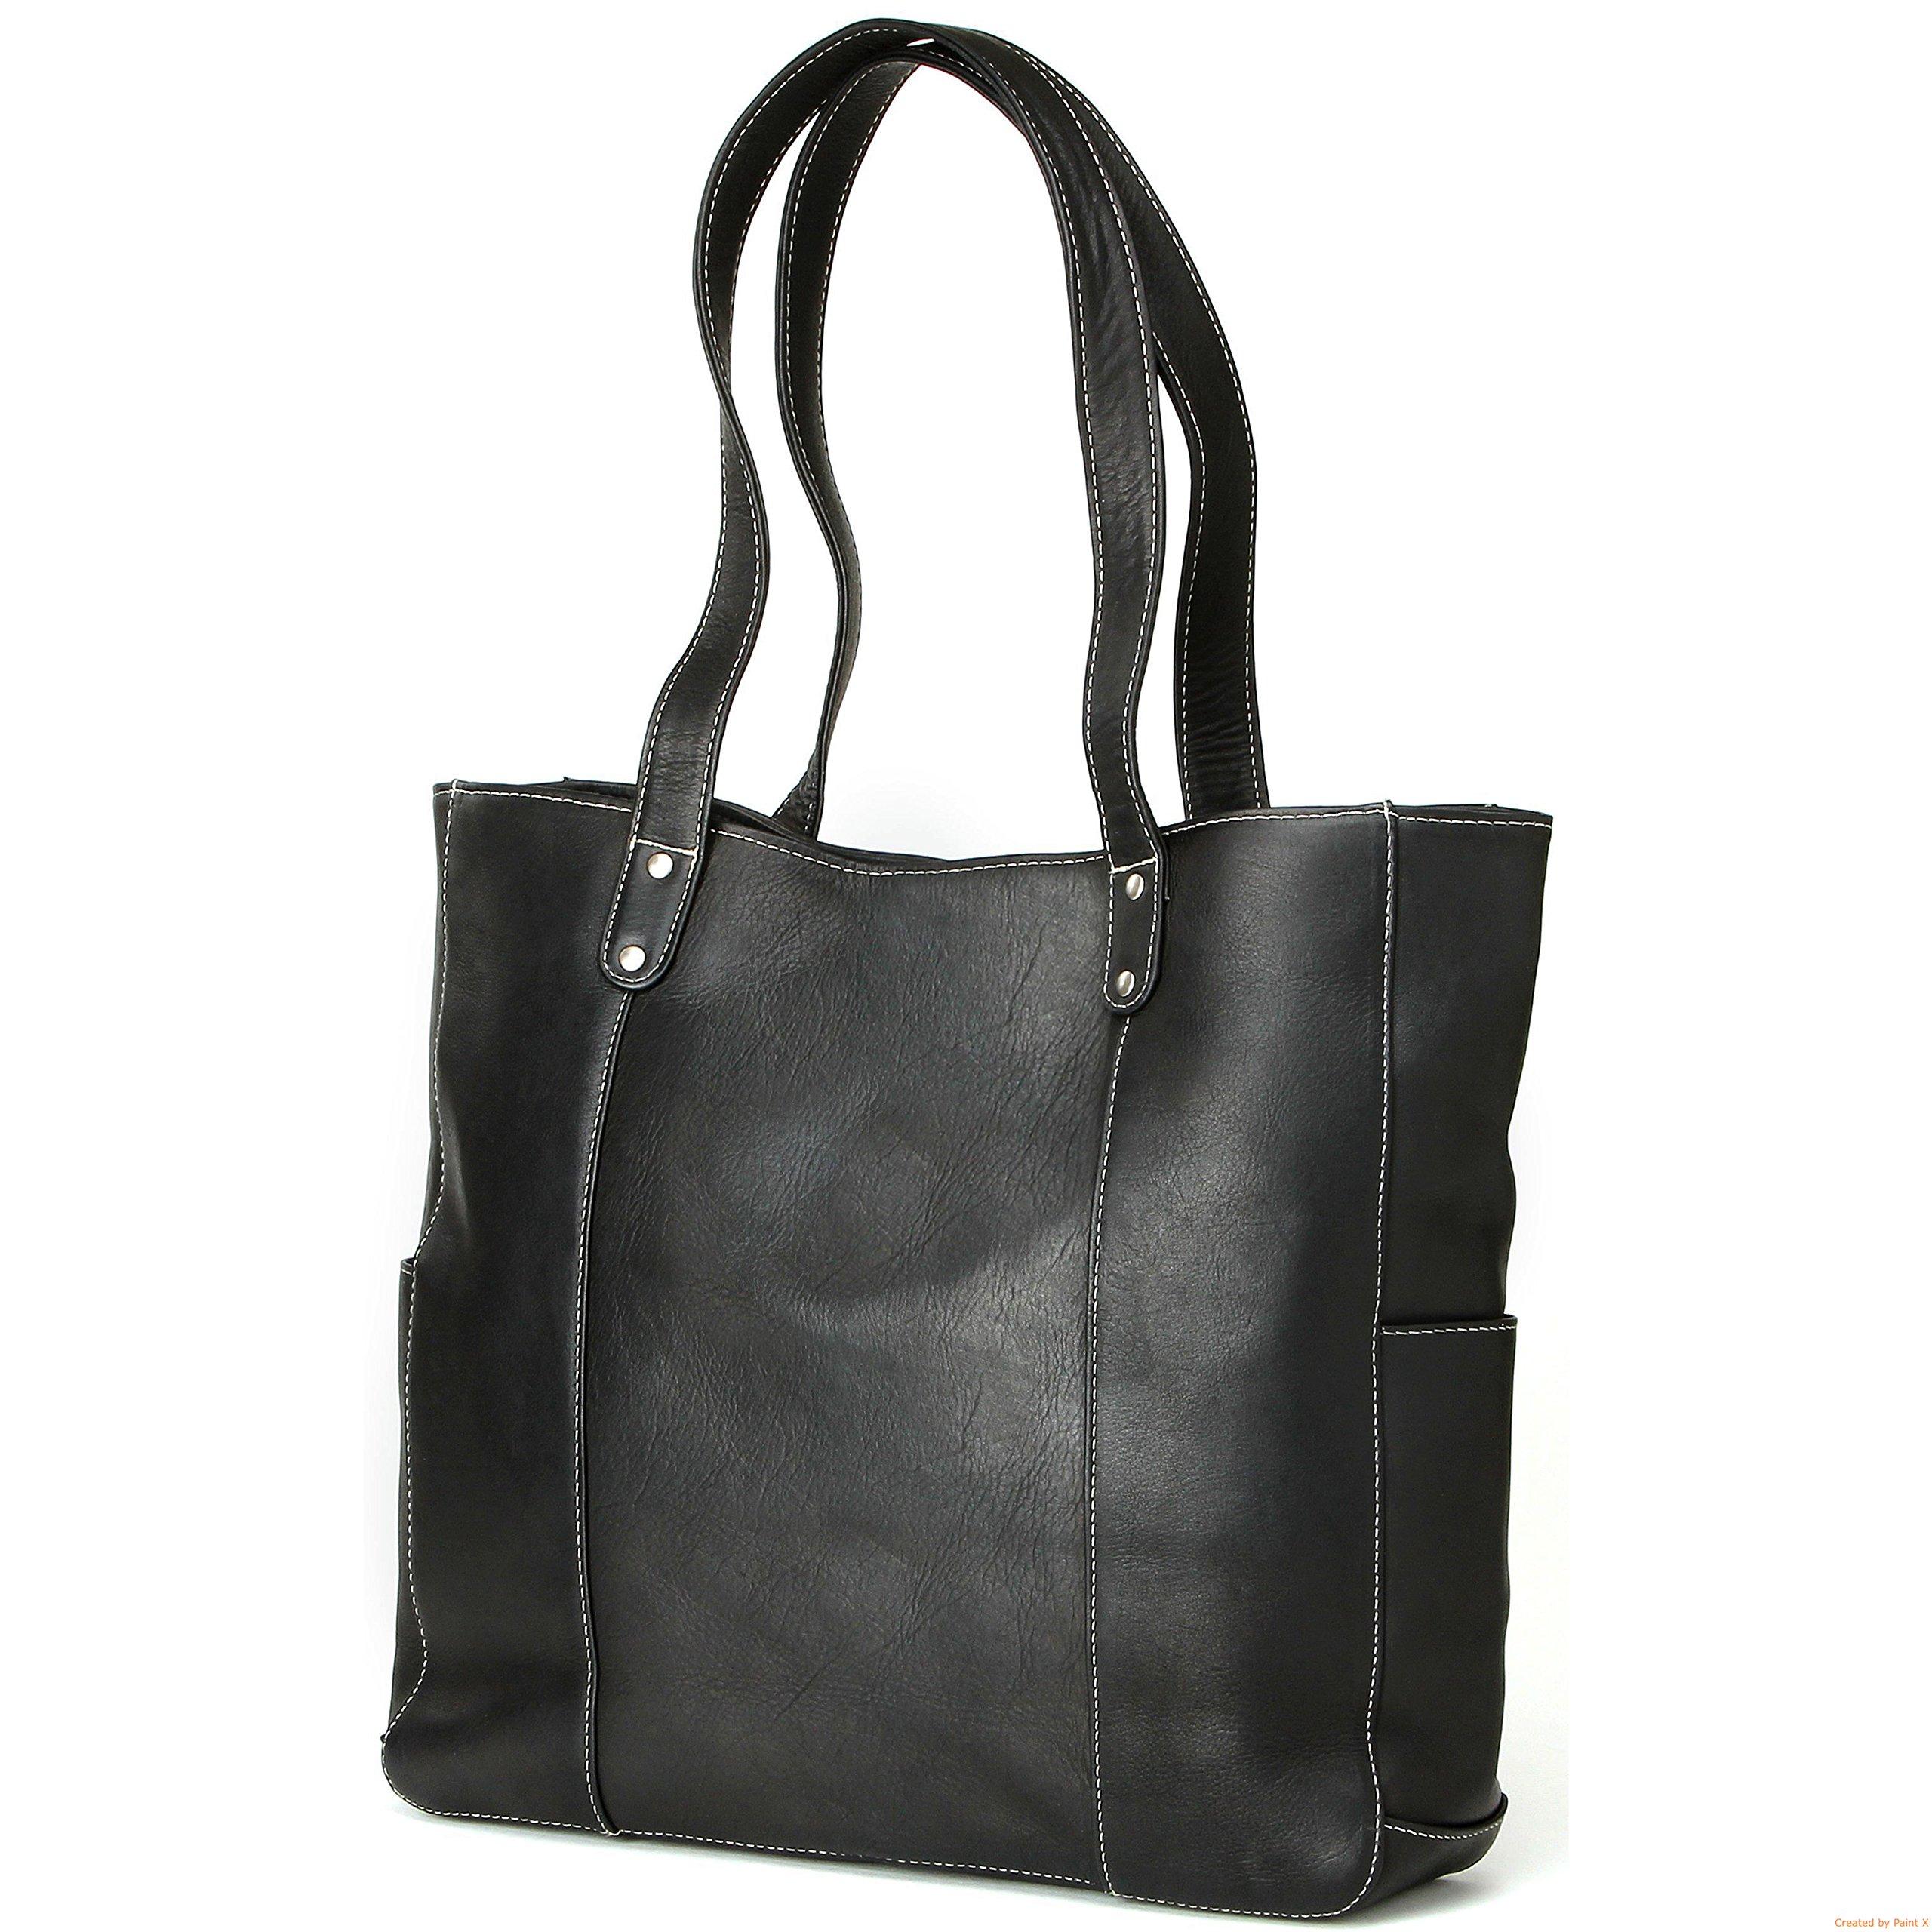 Black Double Strap Rivet Tote Bag, Magnet Closure, Leather Material